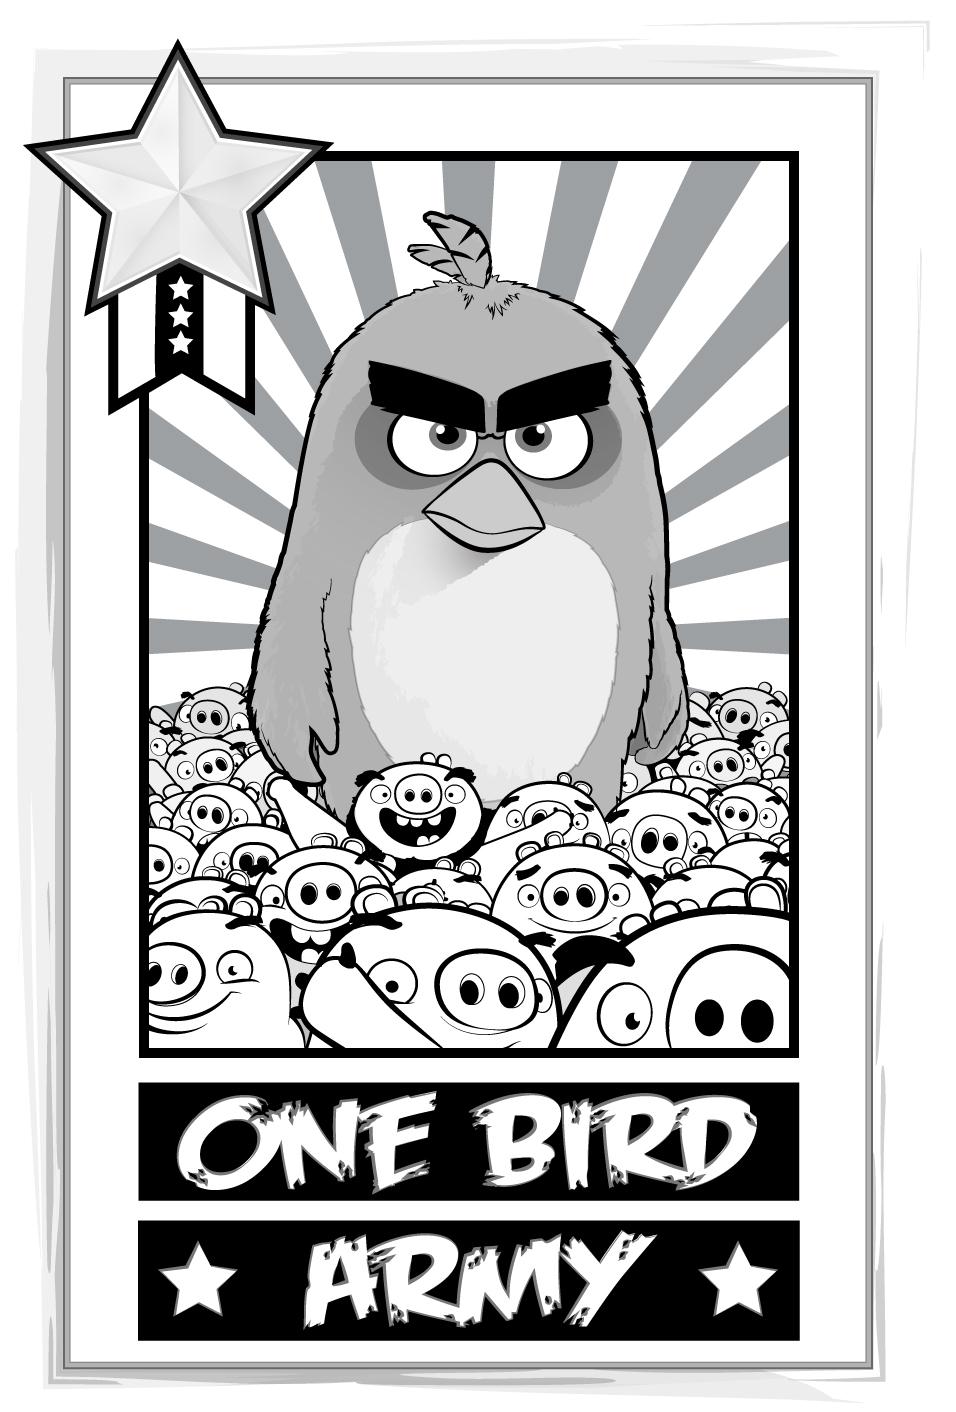 Angry Birds award Mock up